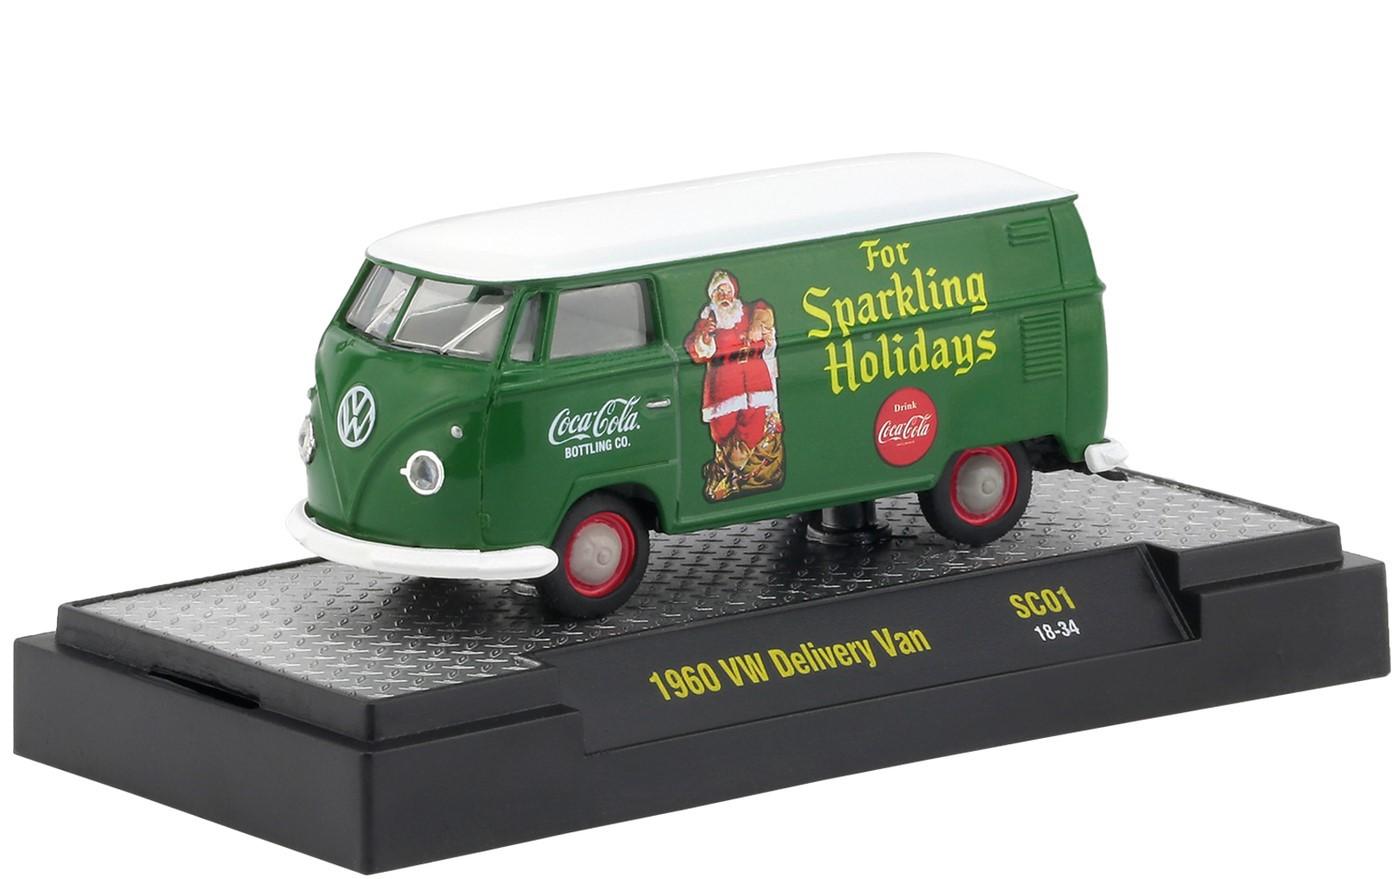 Miniatura Volkswagen Kombi 1960 Verde e Branca Coca Cola Santa Claus 1/64 M2